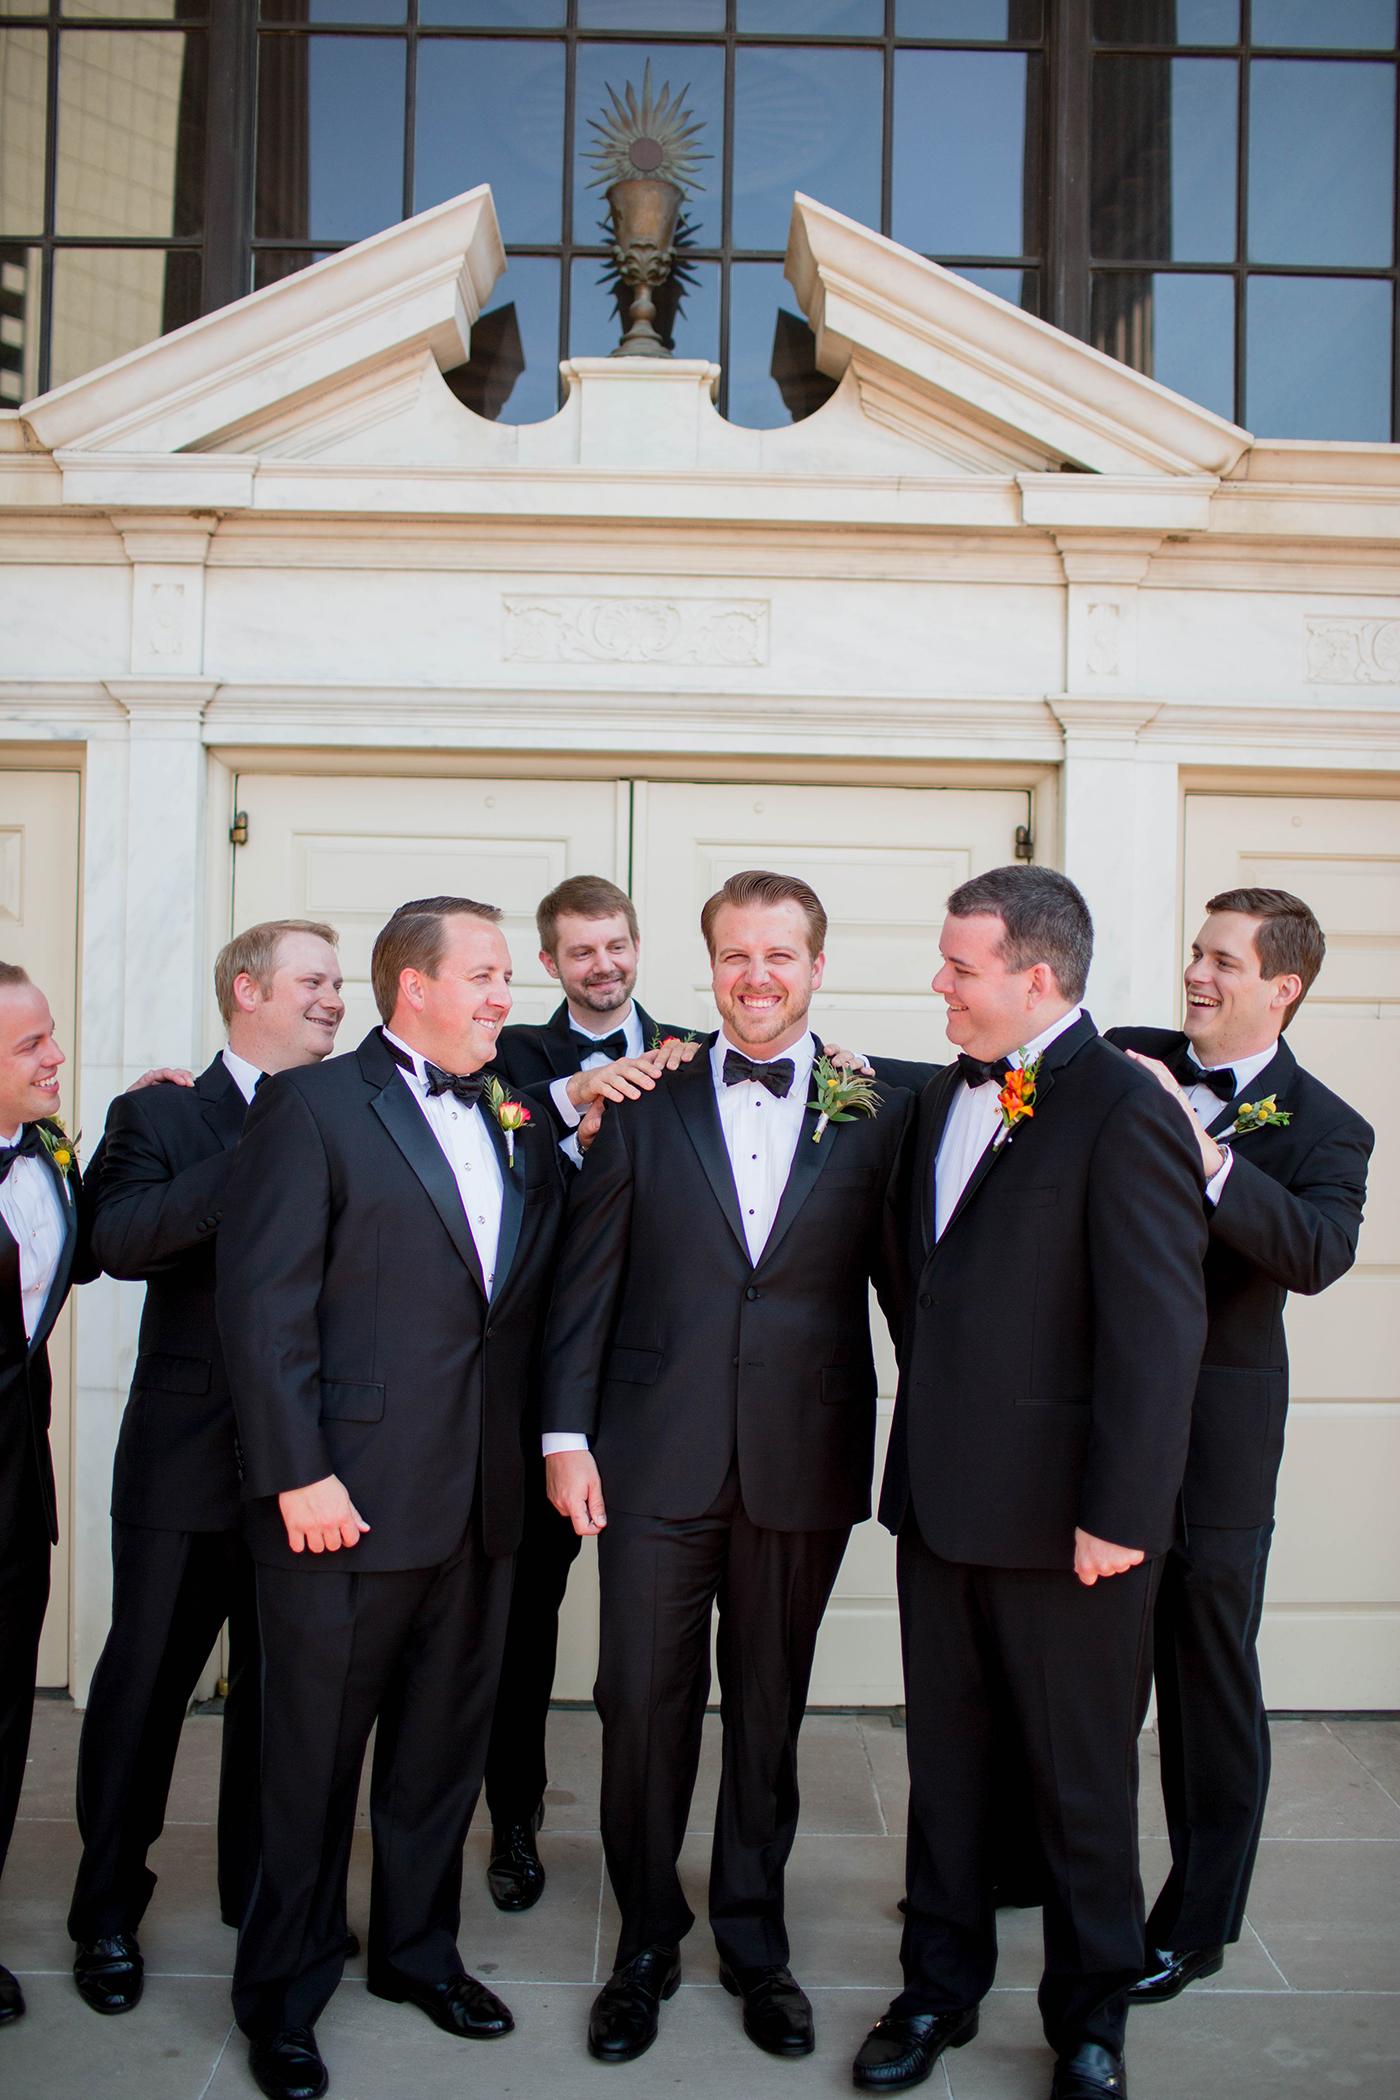 Dallas TX Wedding Planner - Allday Events - Hall on Dragon Wedding - 00108.jpg